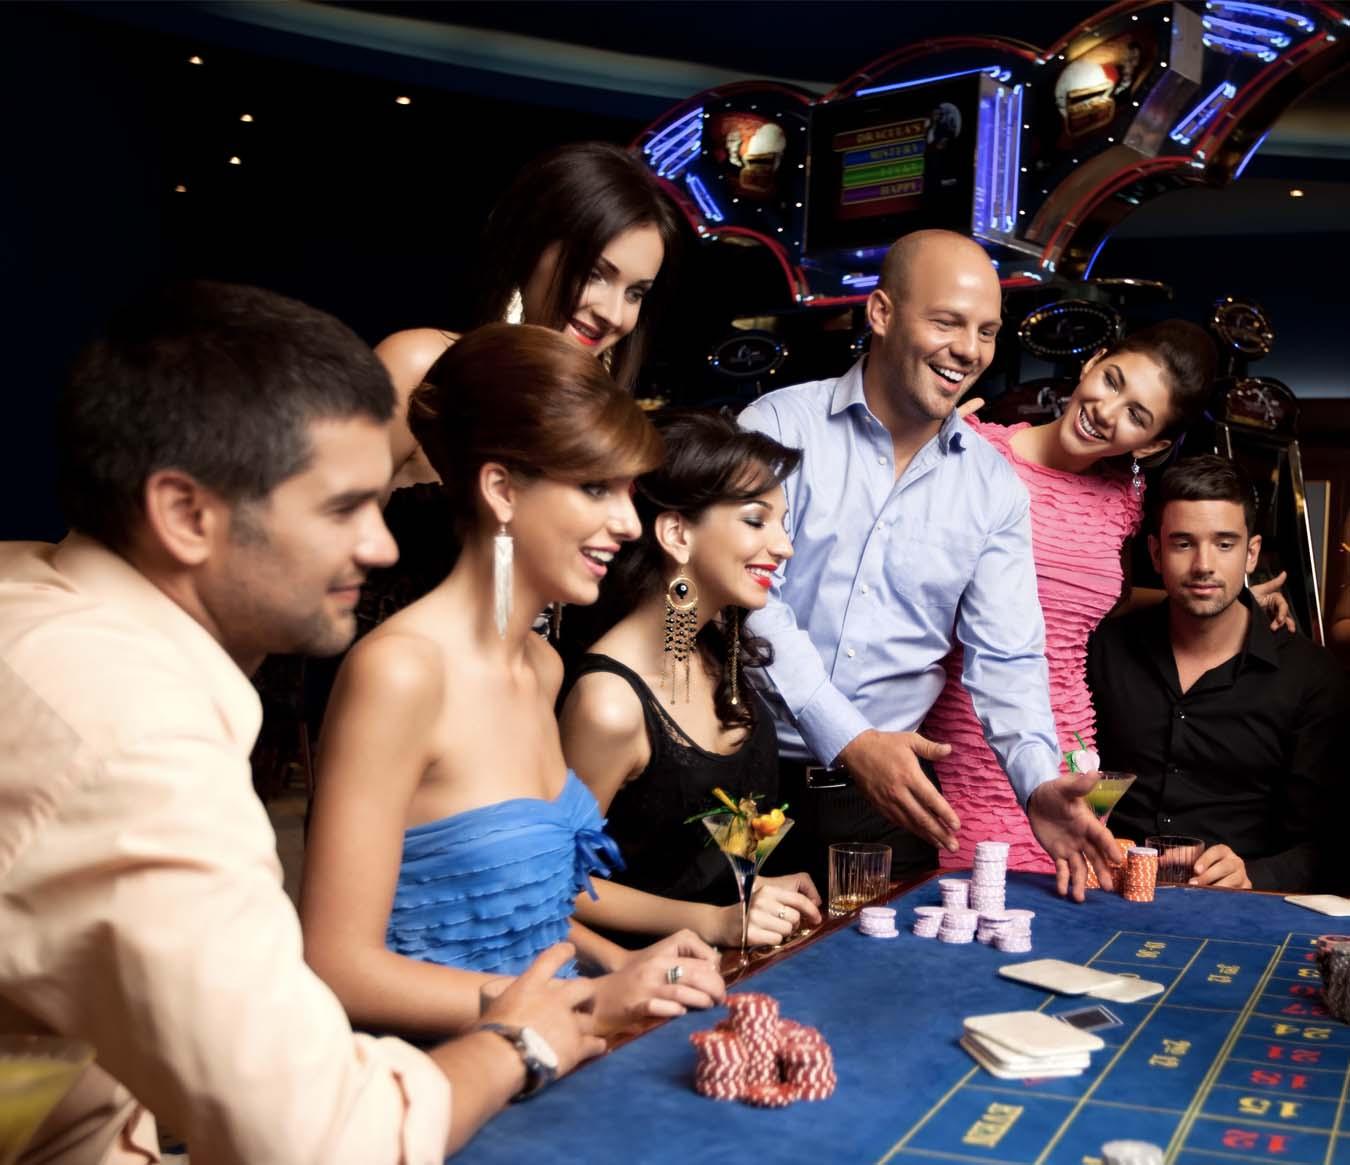 Things to Do in Phoenix - Casinos in Phoenix